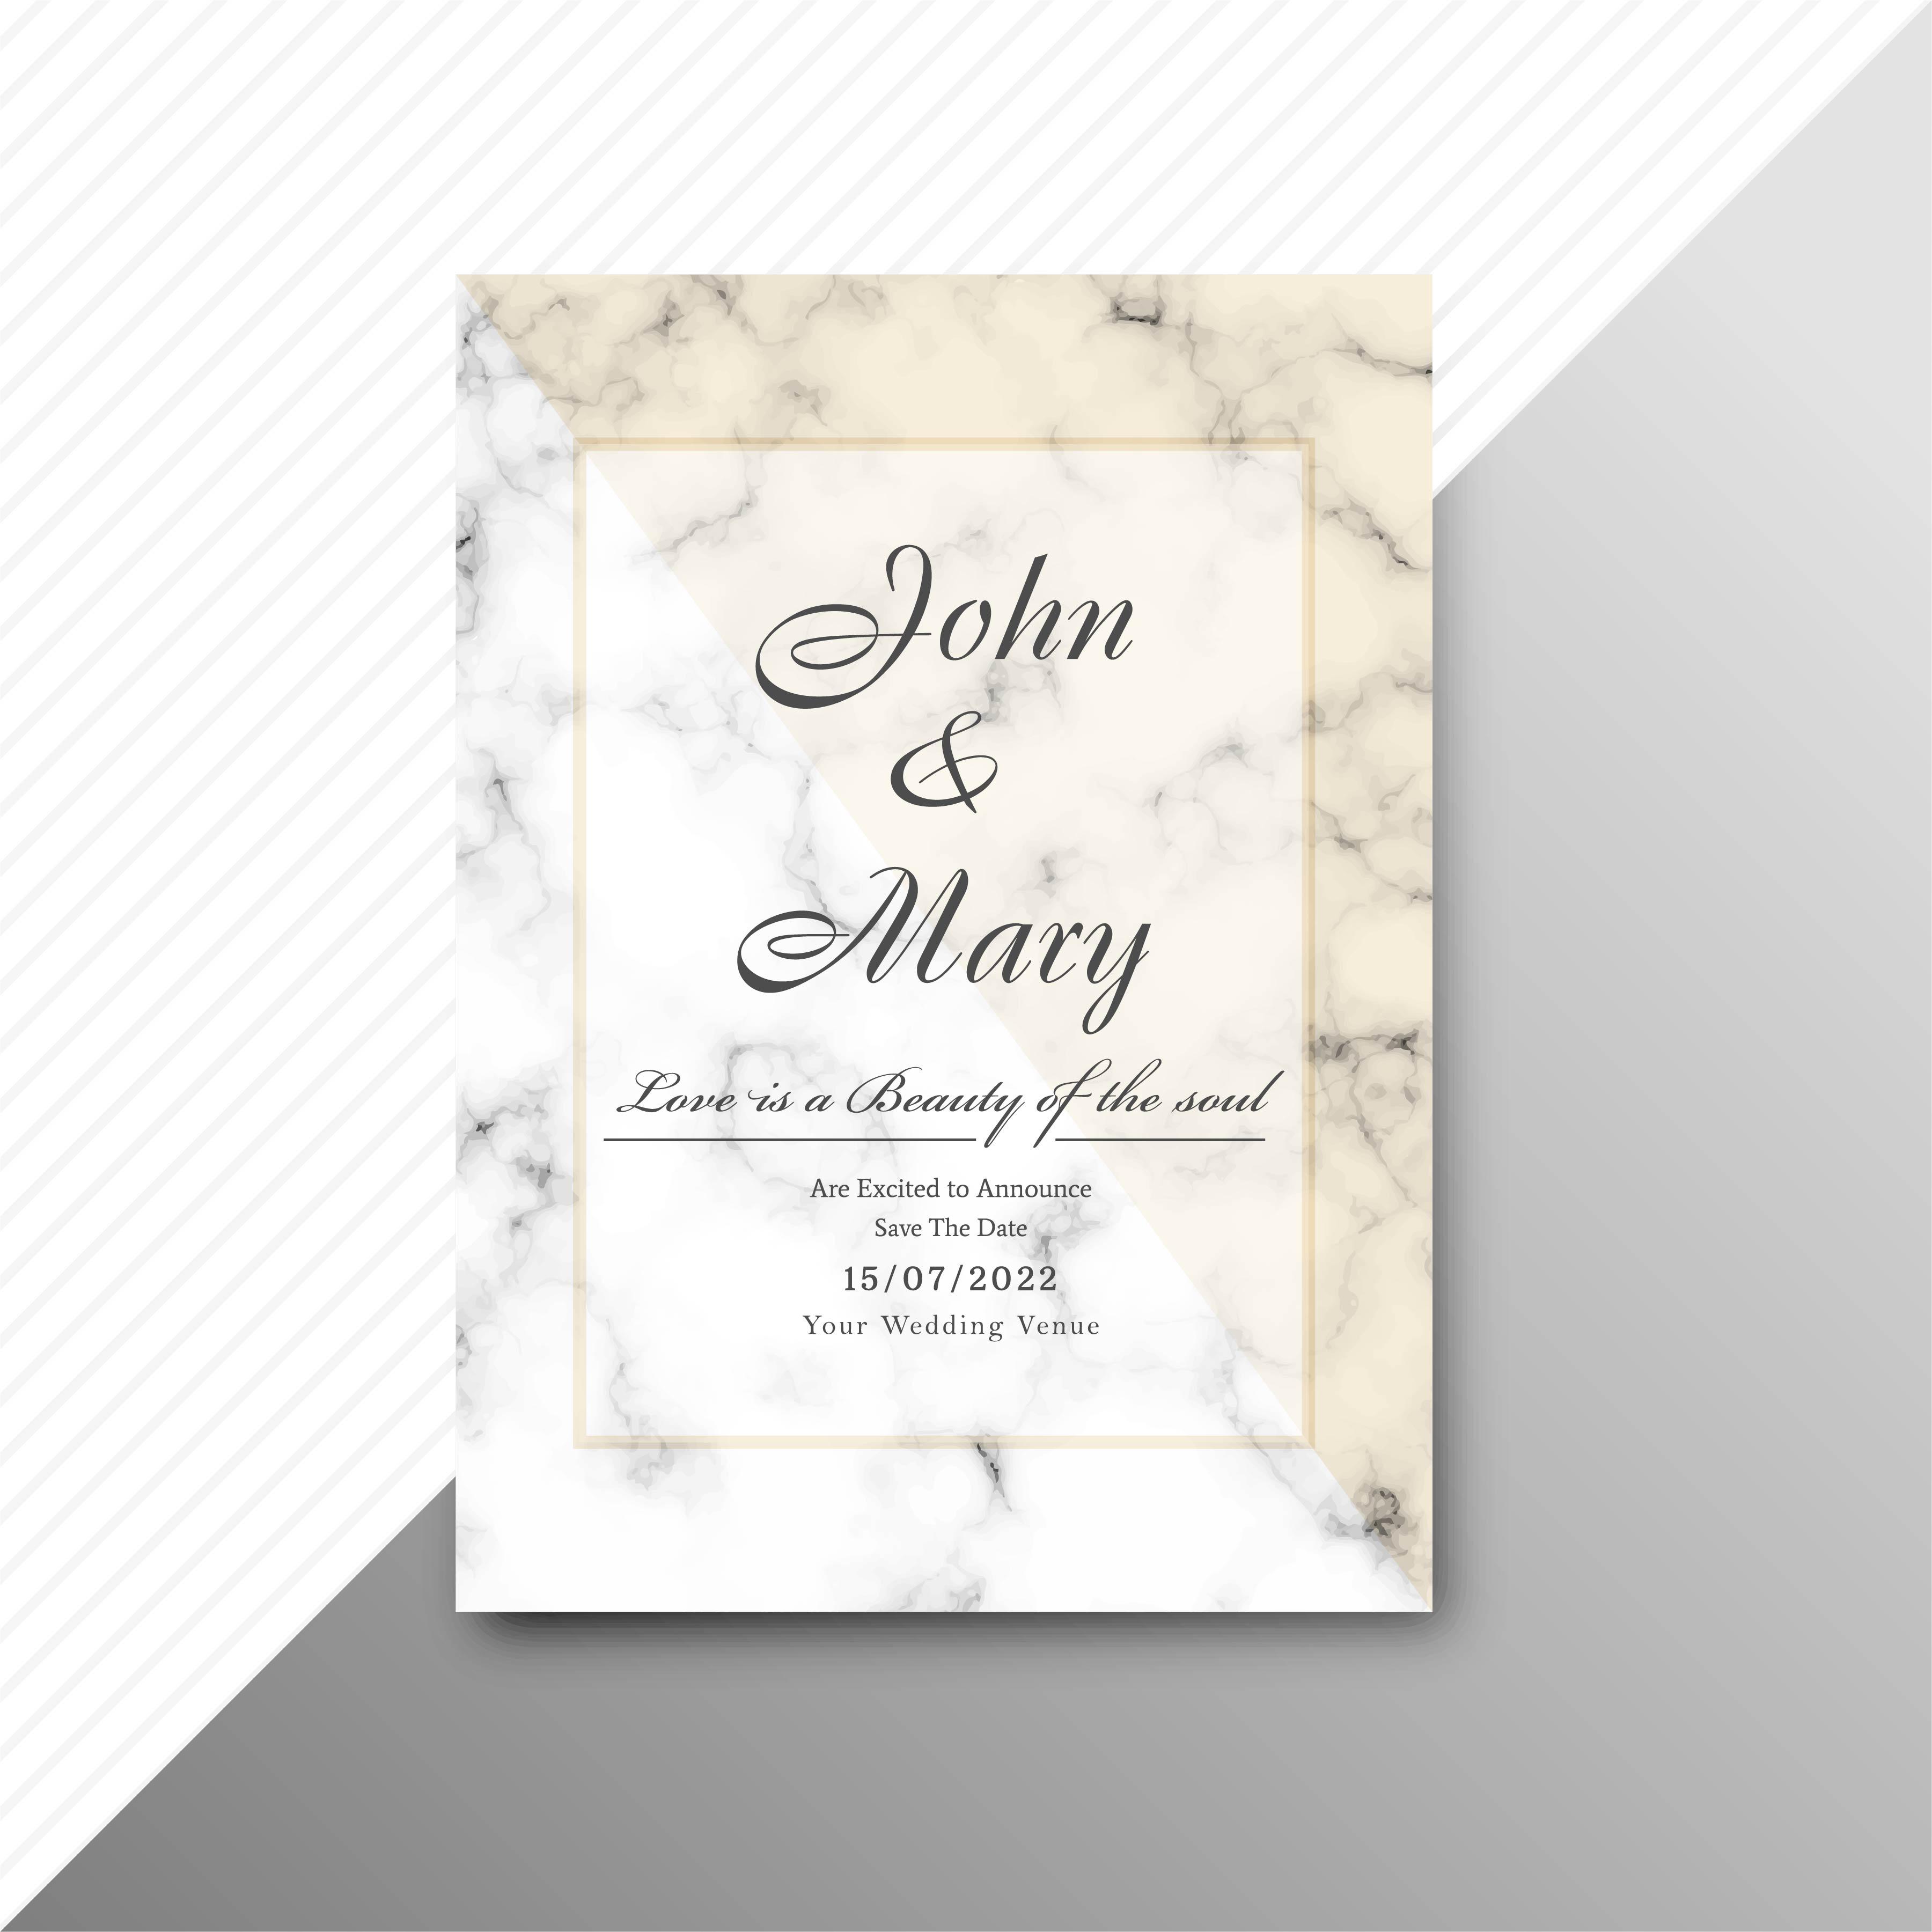 modern wedding invitation card background  download free